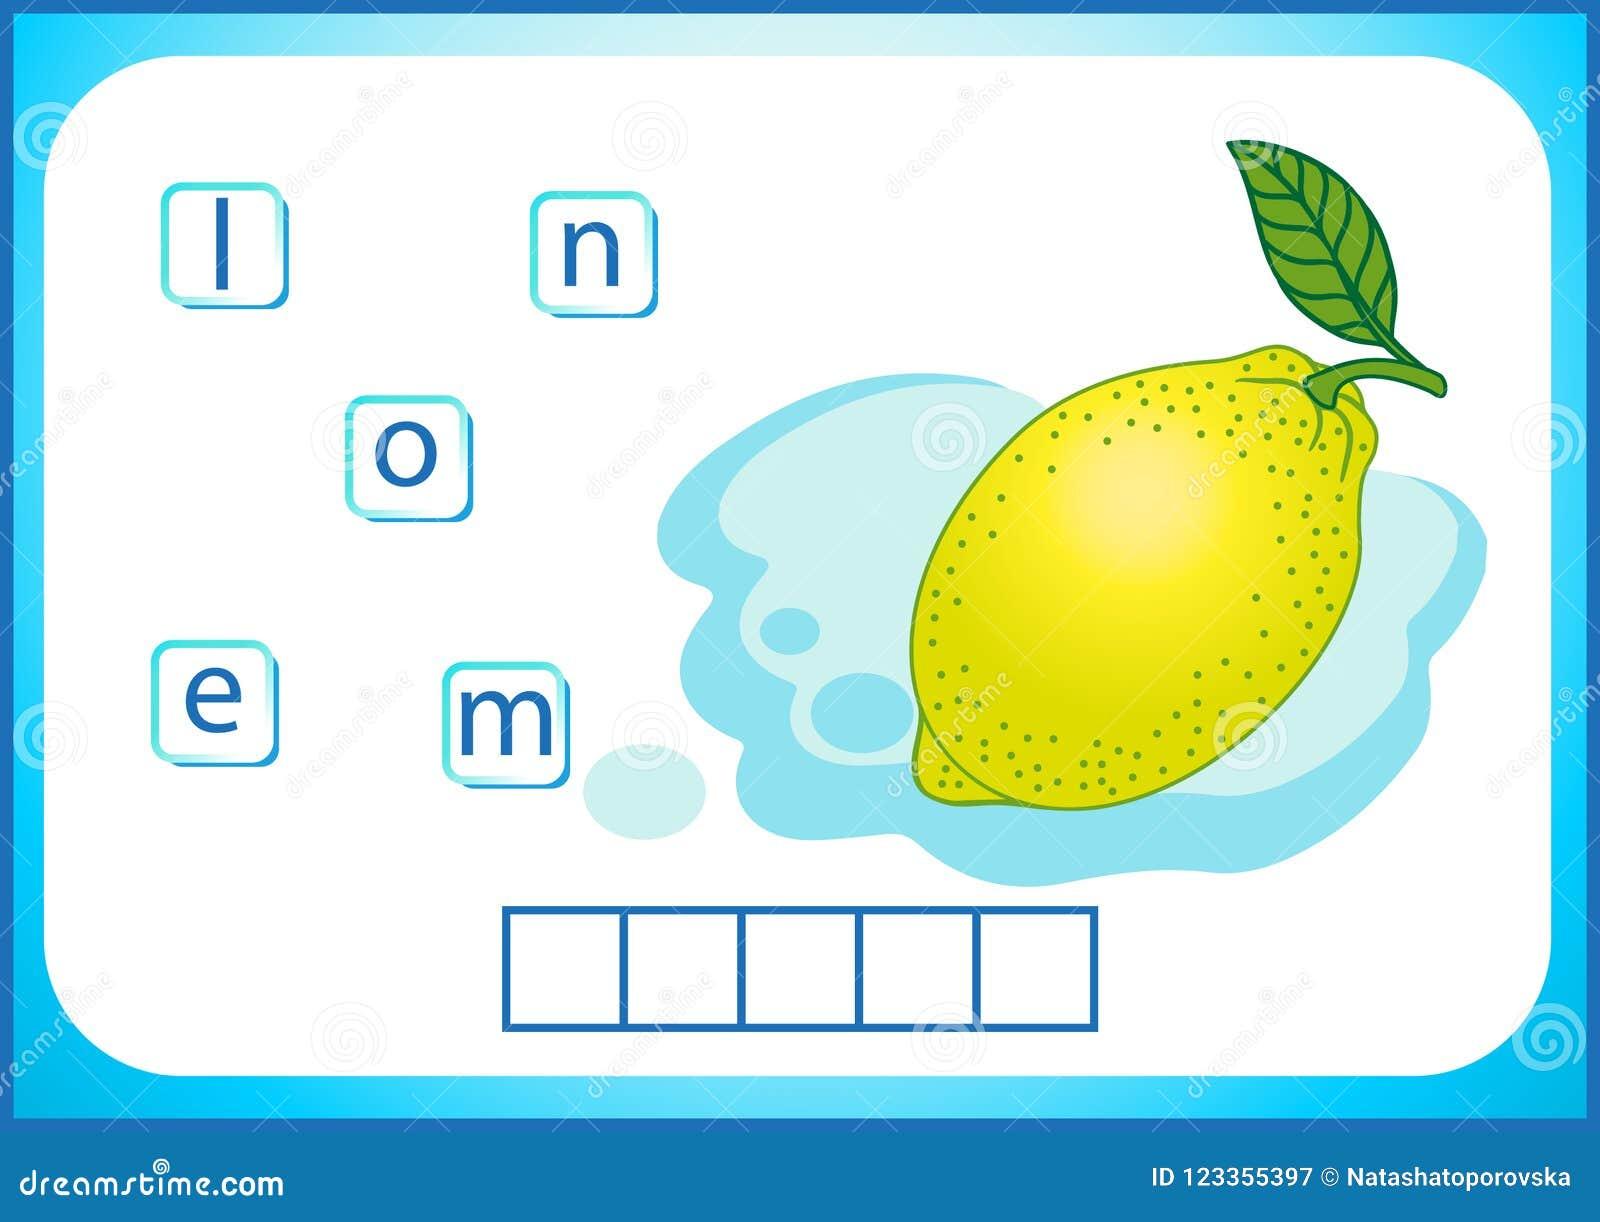 School Education. English Flashcard For Learning English. We Write ...